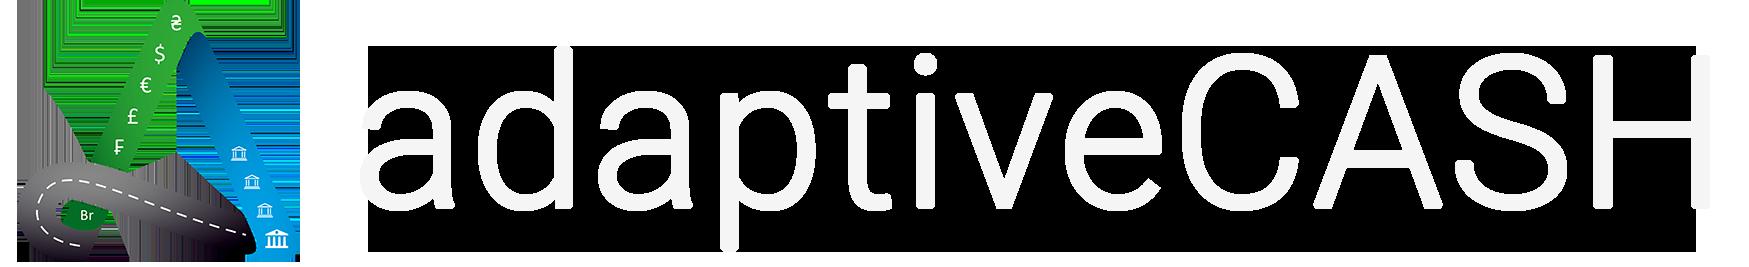 adaptiveCASH